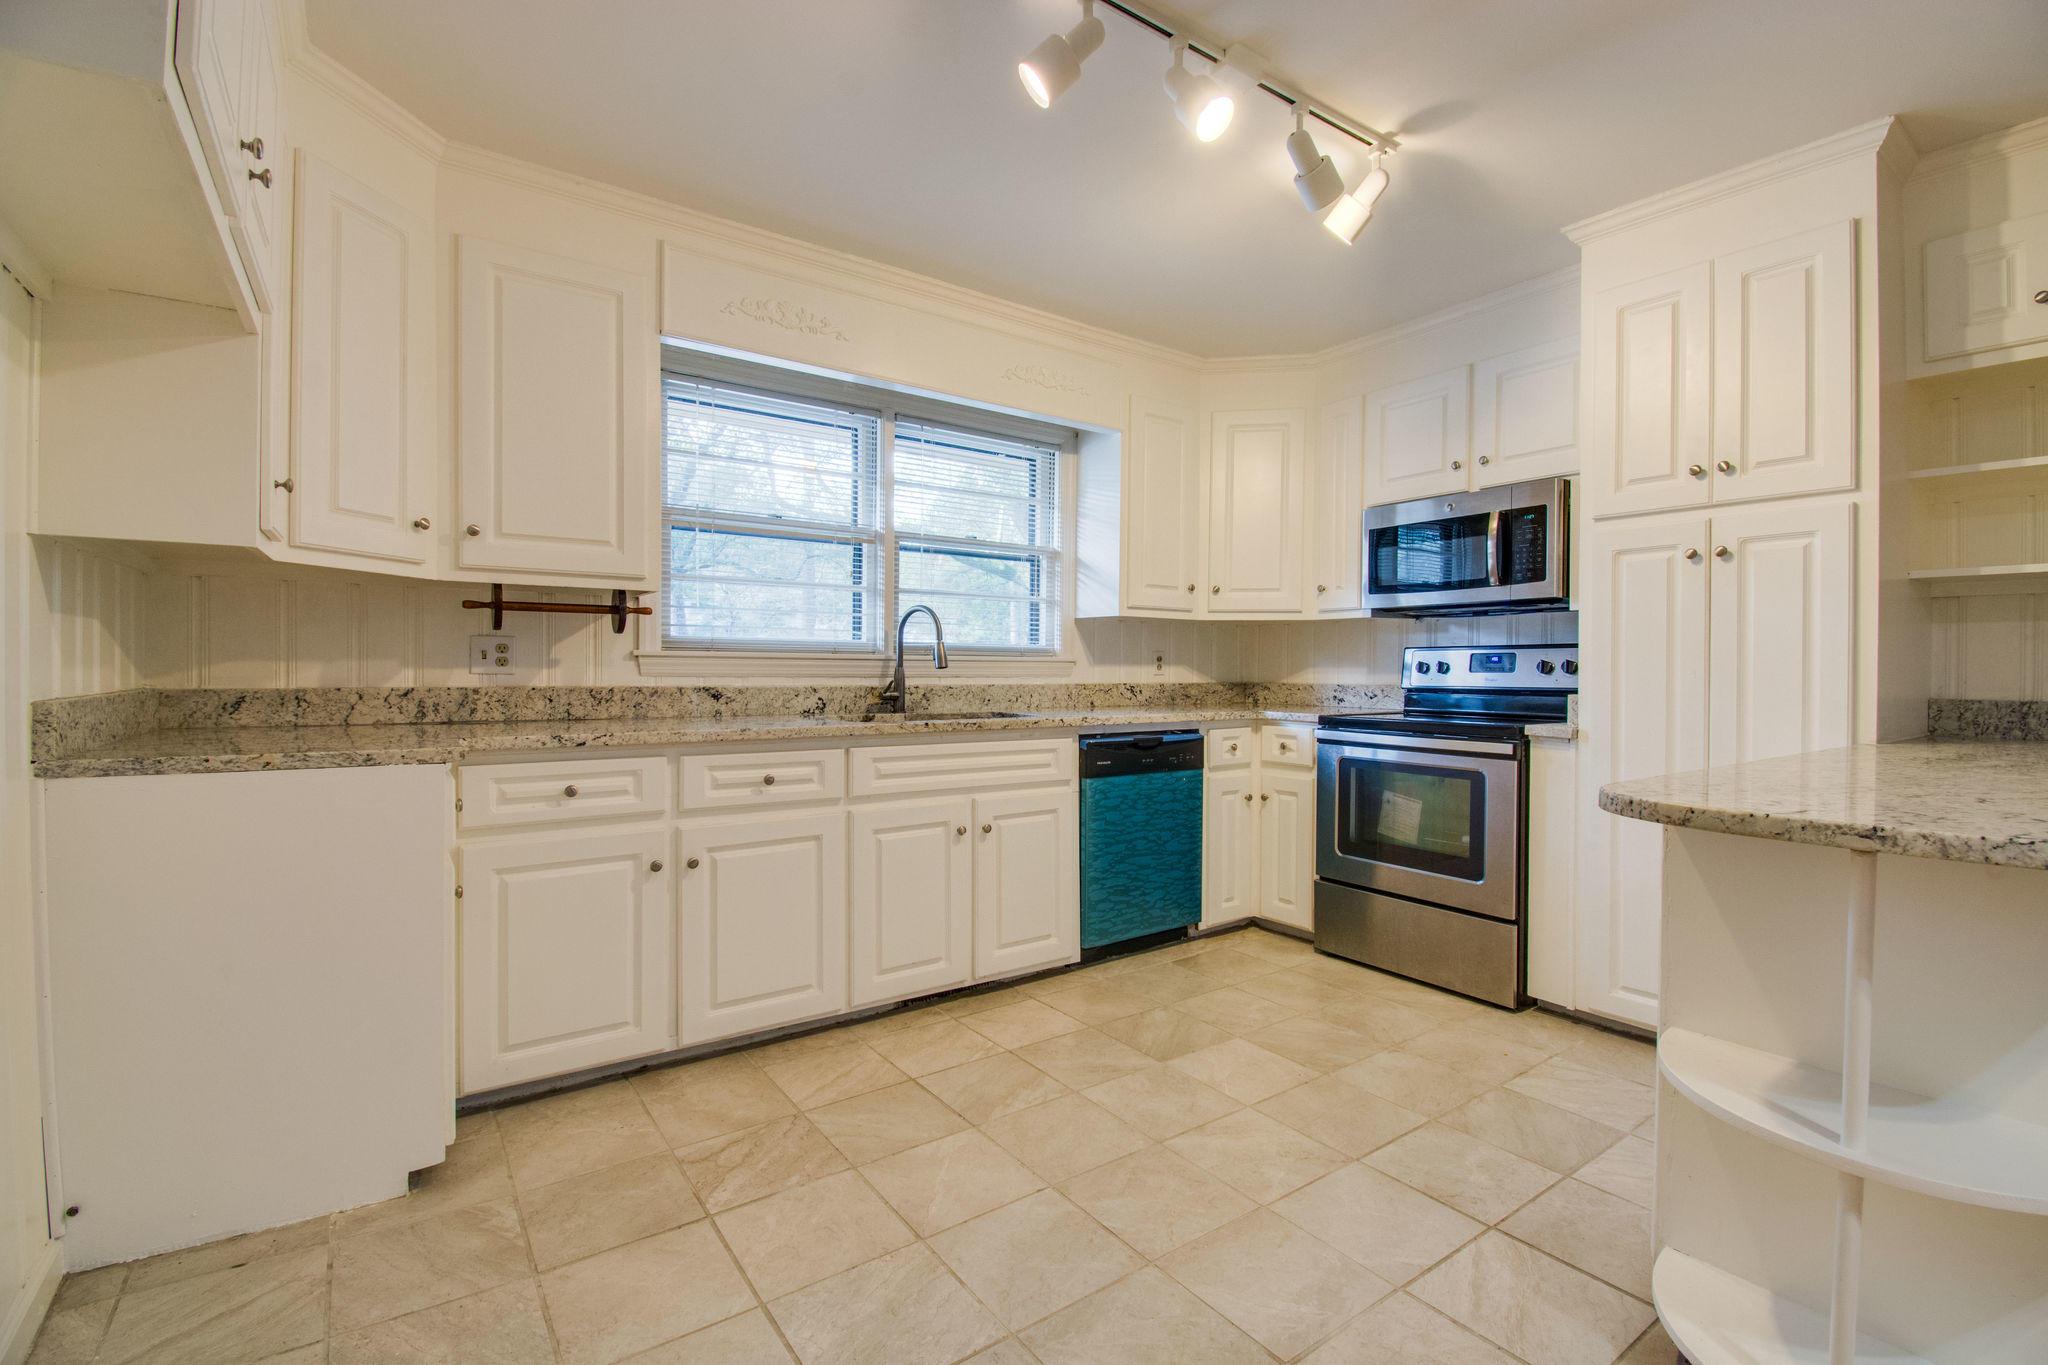 Northbridge Terrace Homes For Sale - 1114 Northbridge, Charleston, SC - 4